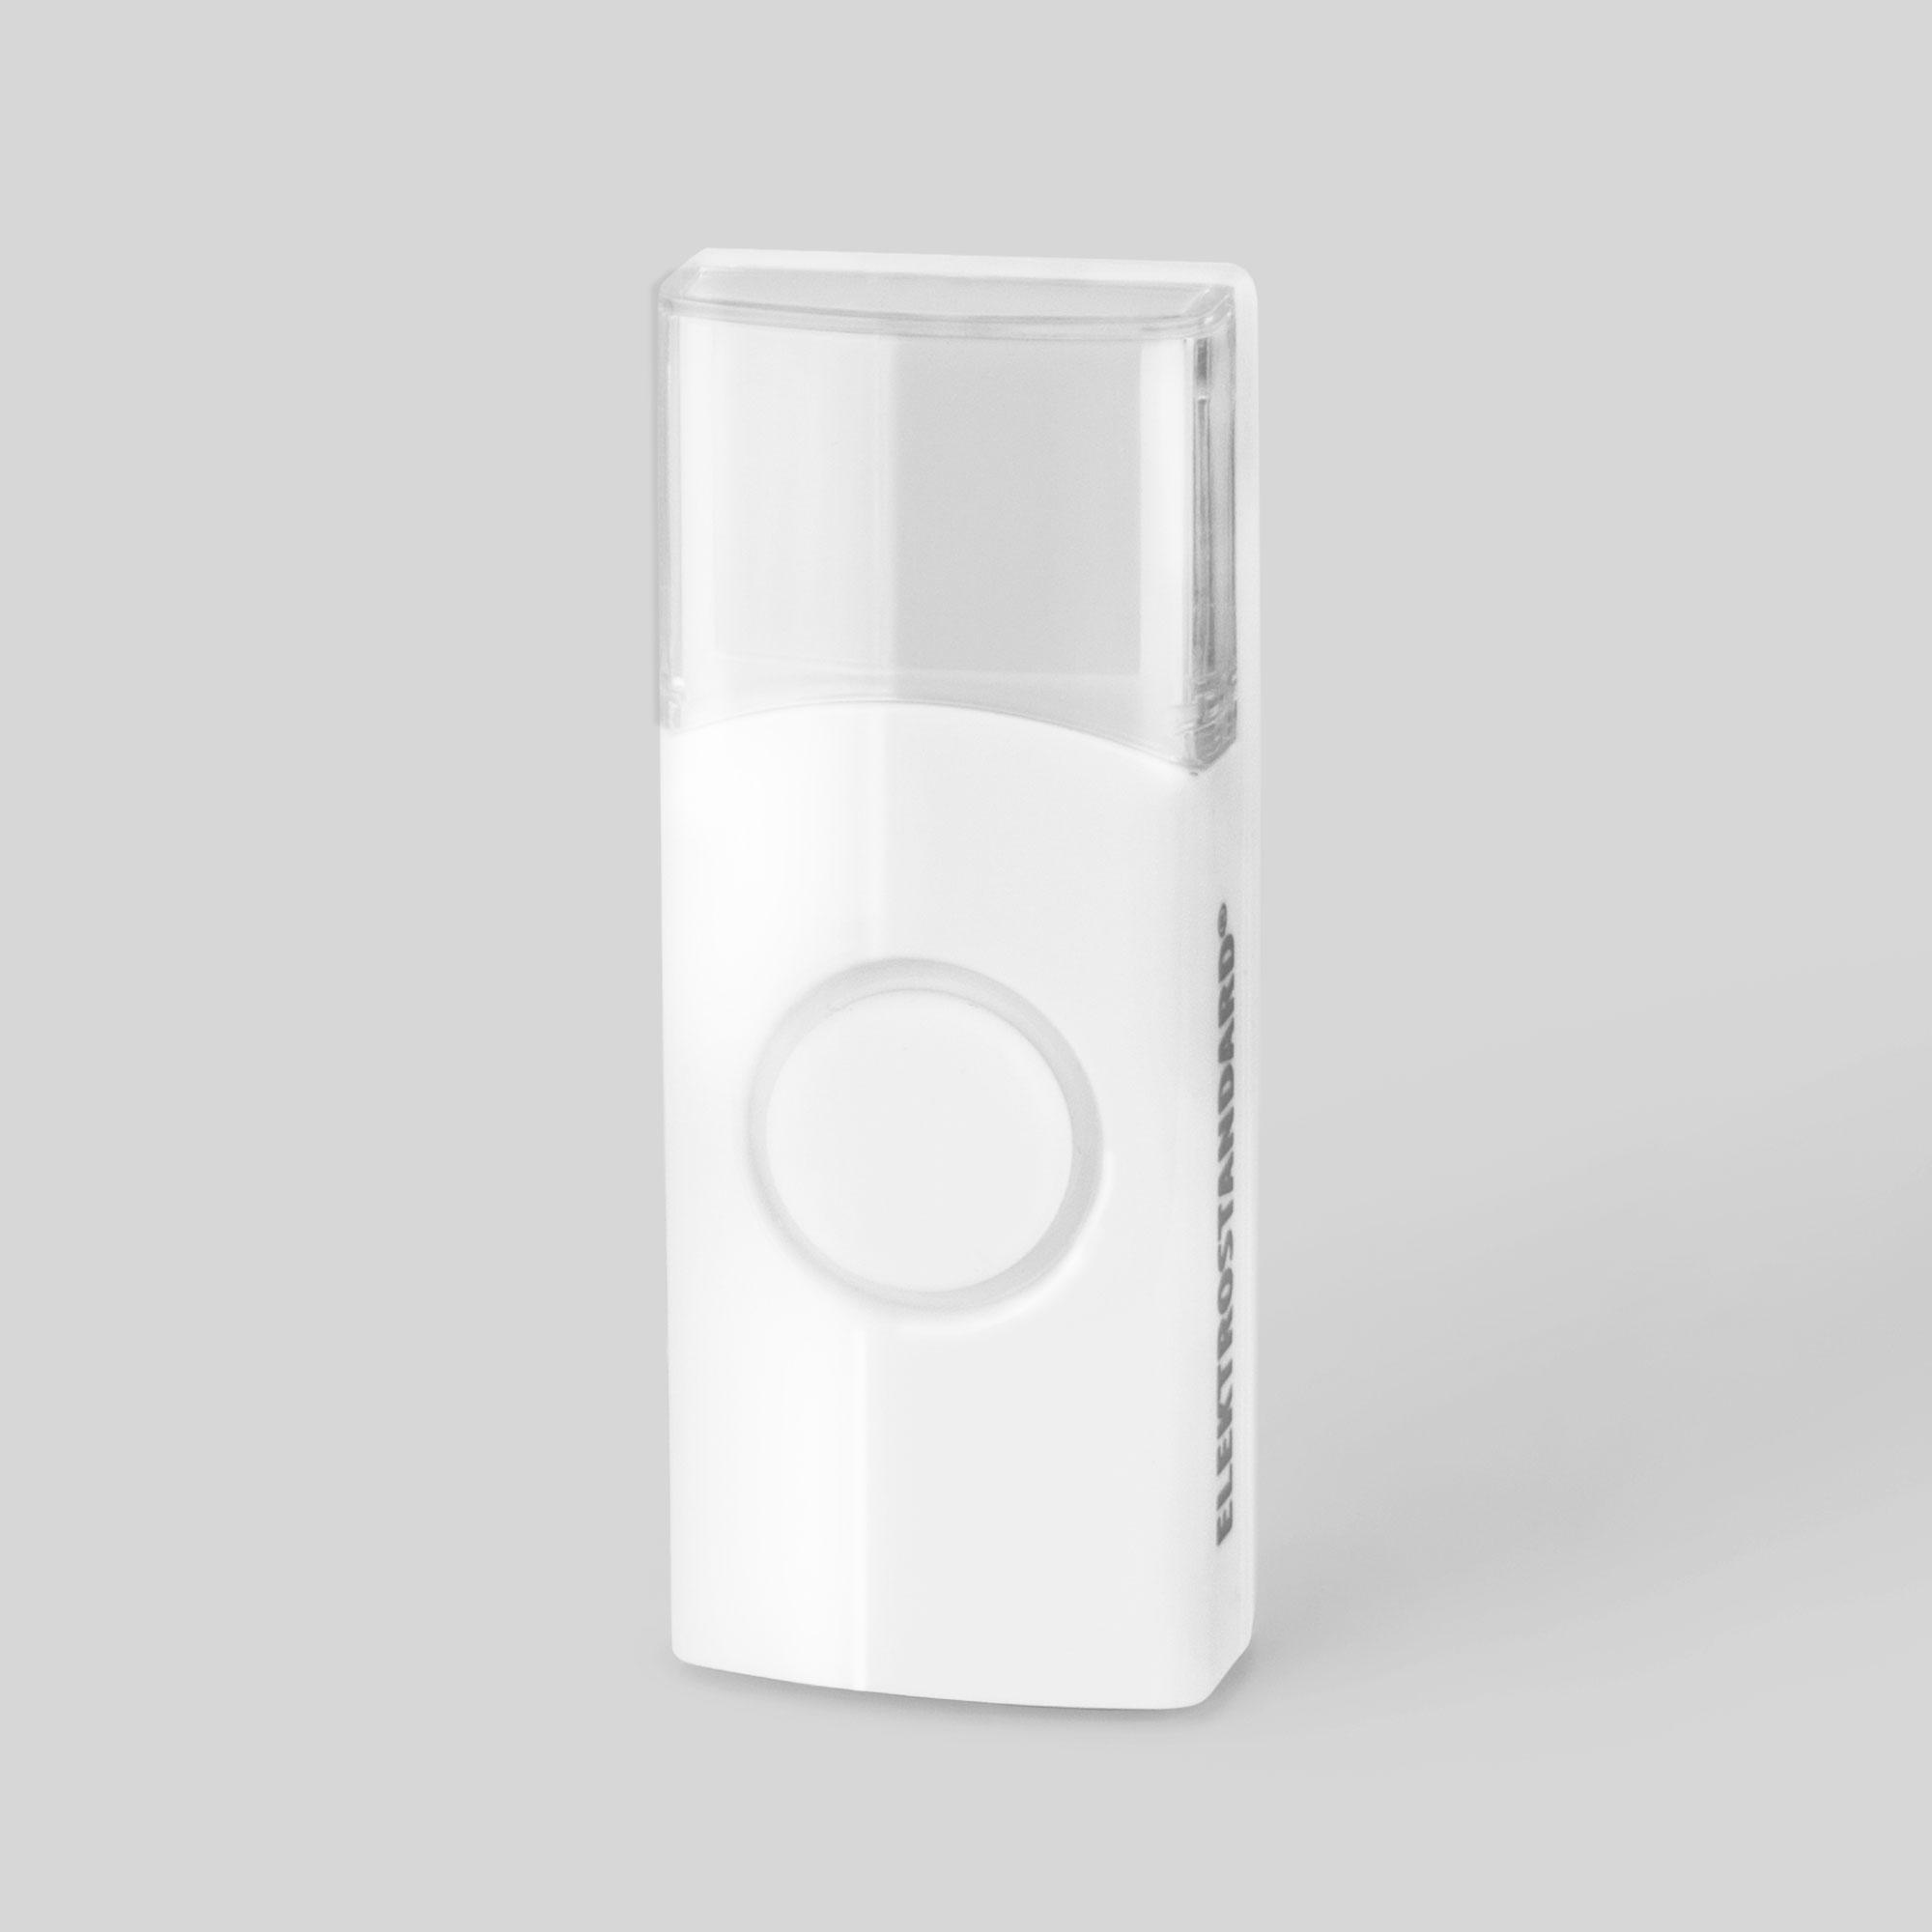 Кнопка DBB01WL Белый